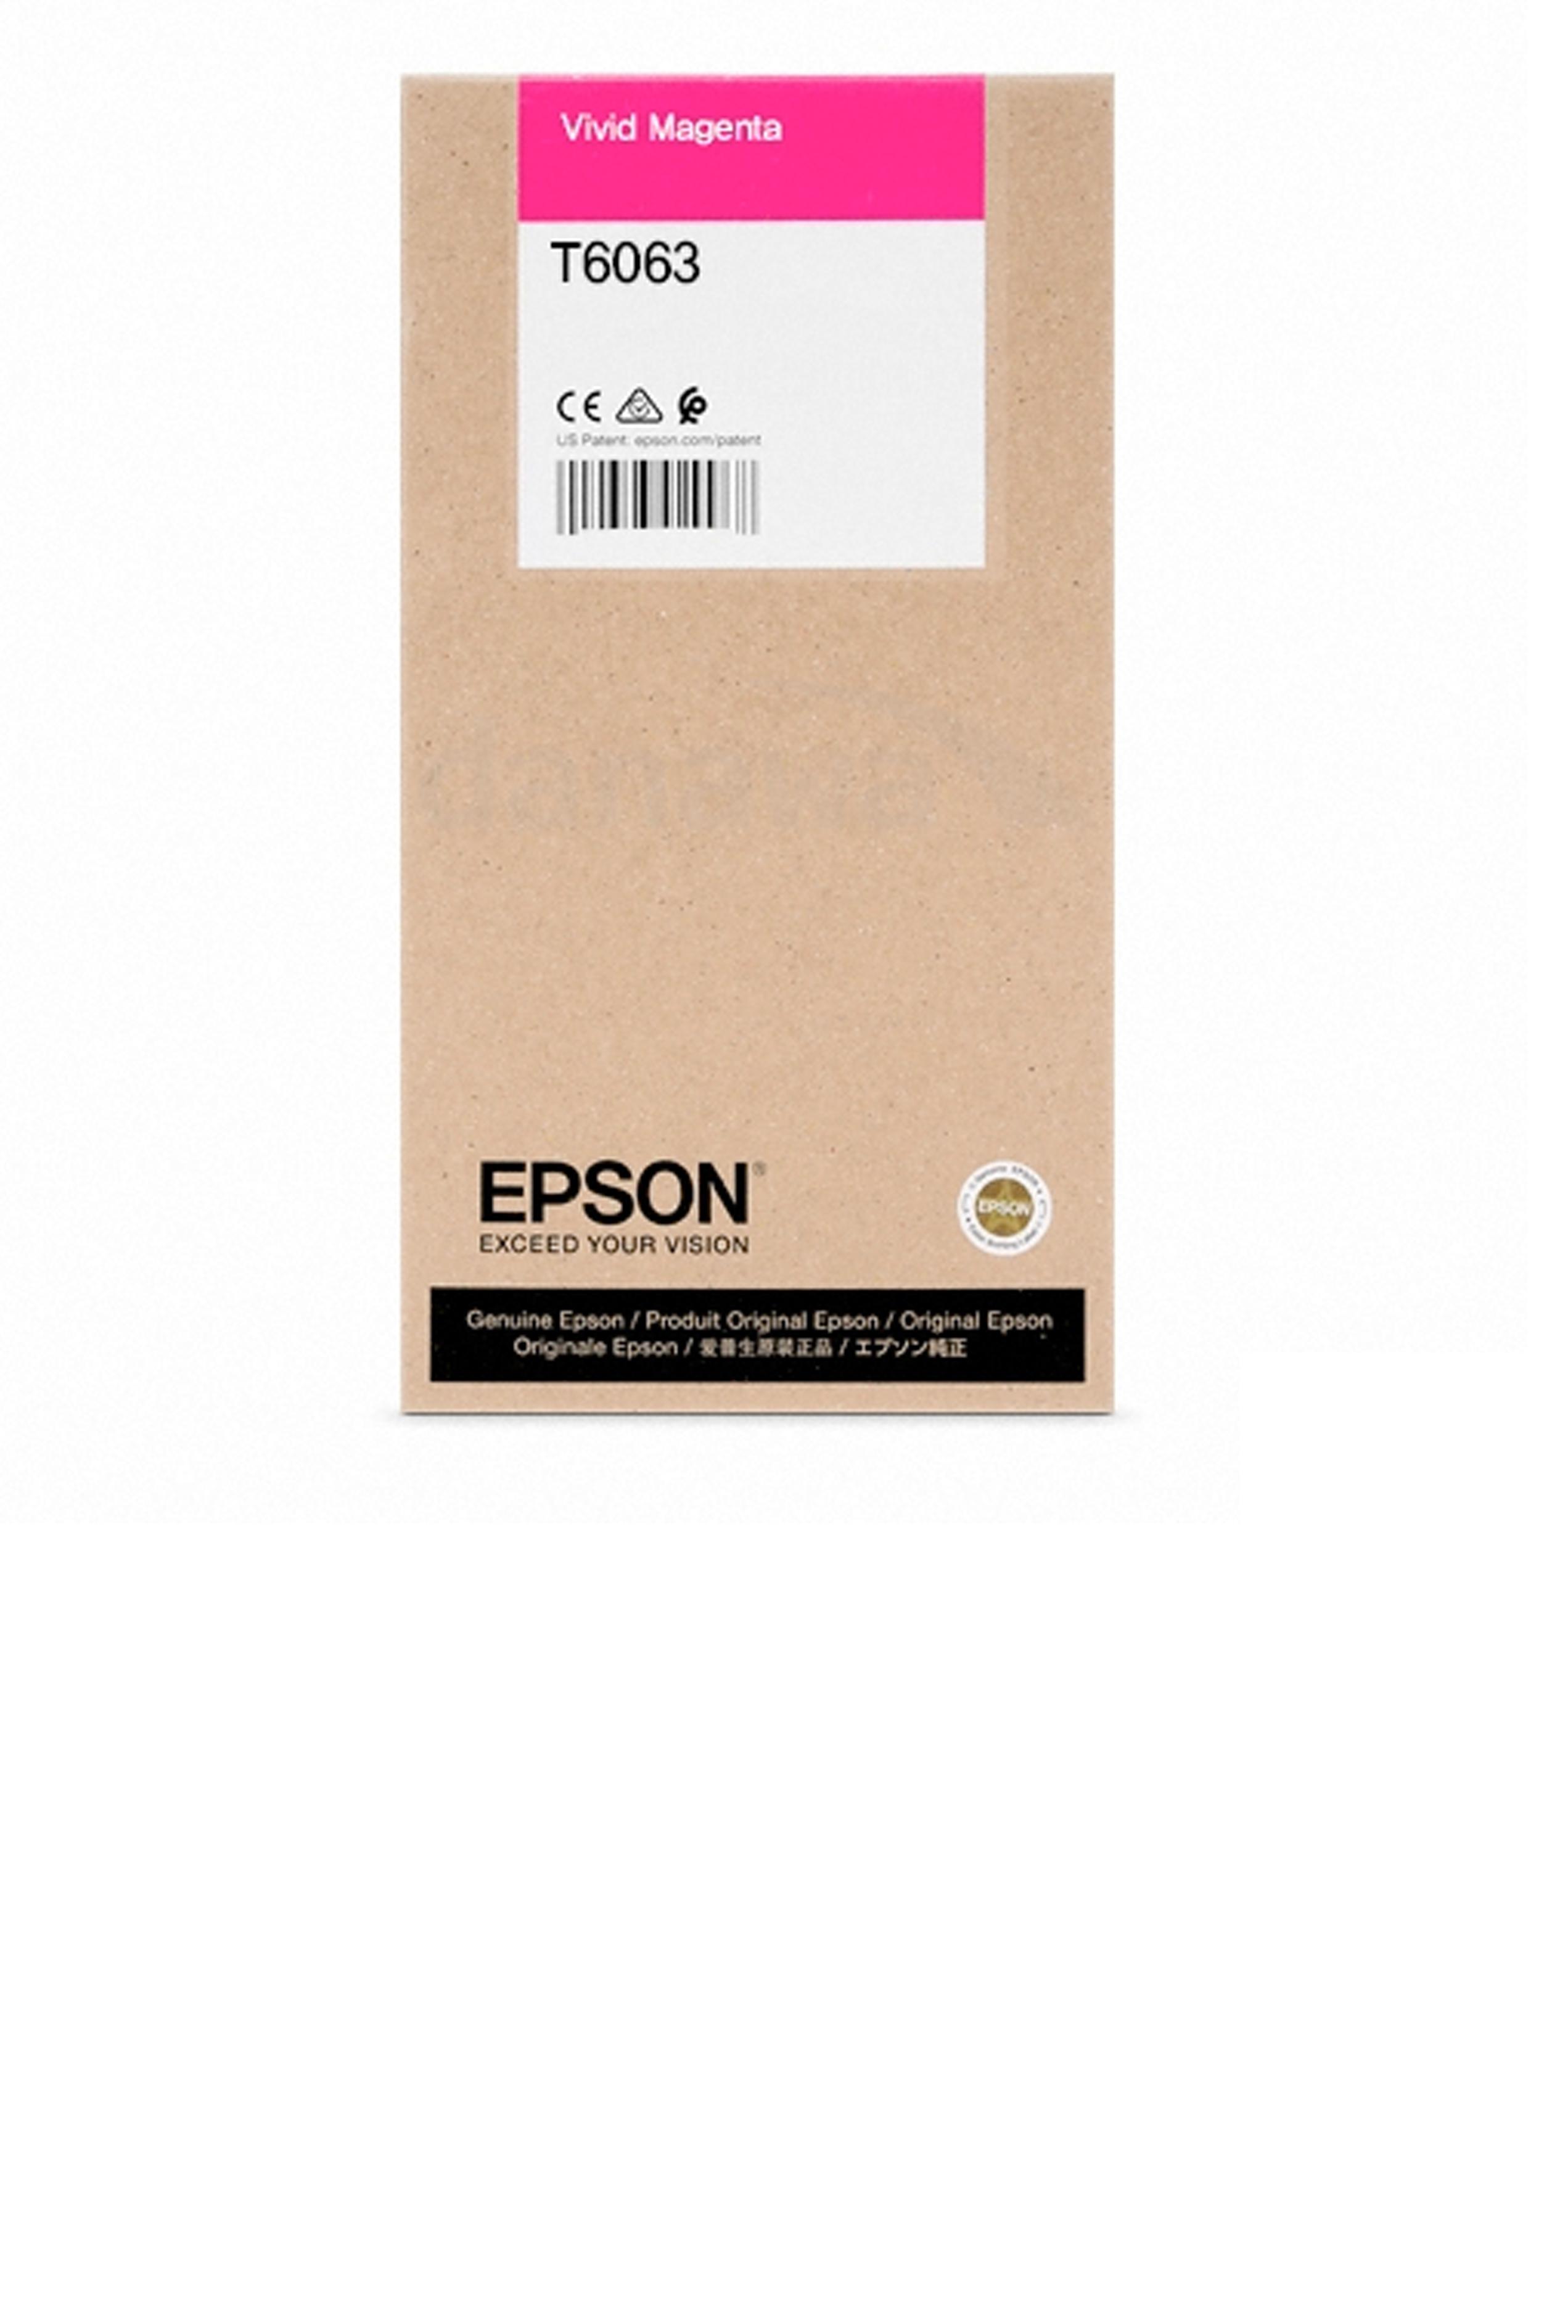 Epson EPSON HI VIVID MAGENTA INK (220 ML) (T606300)